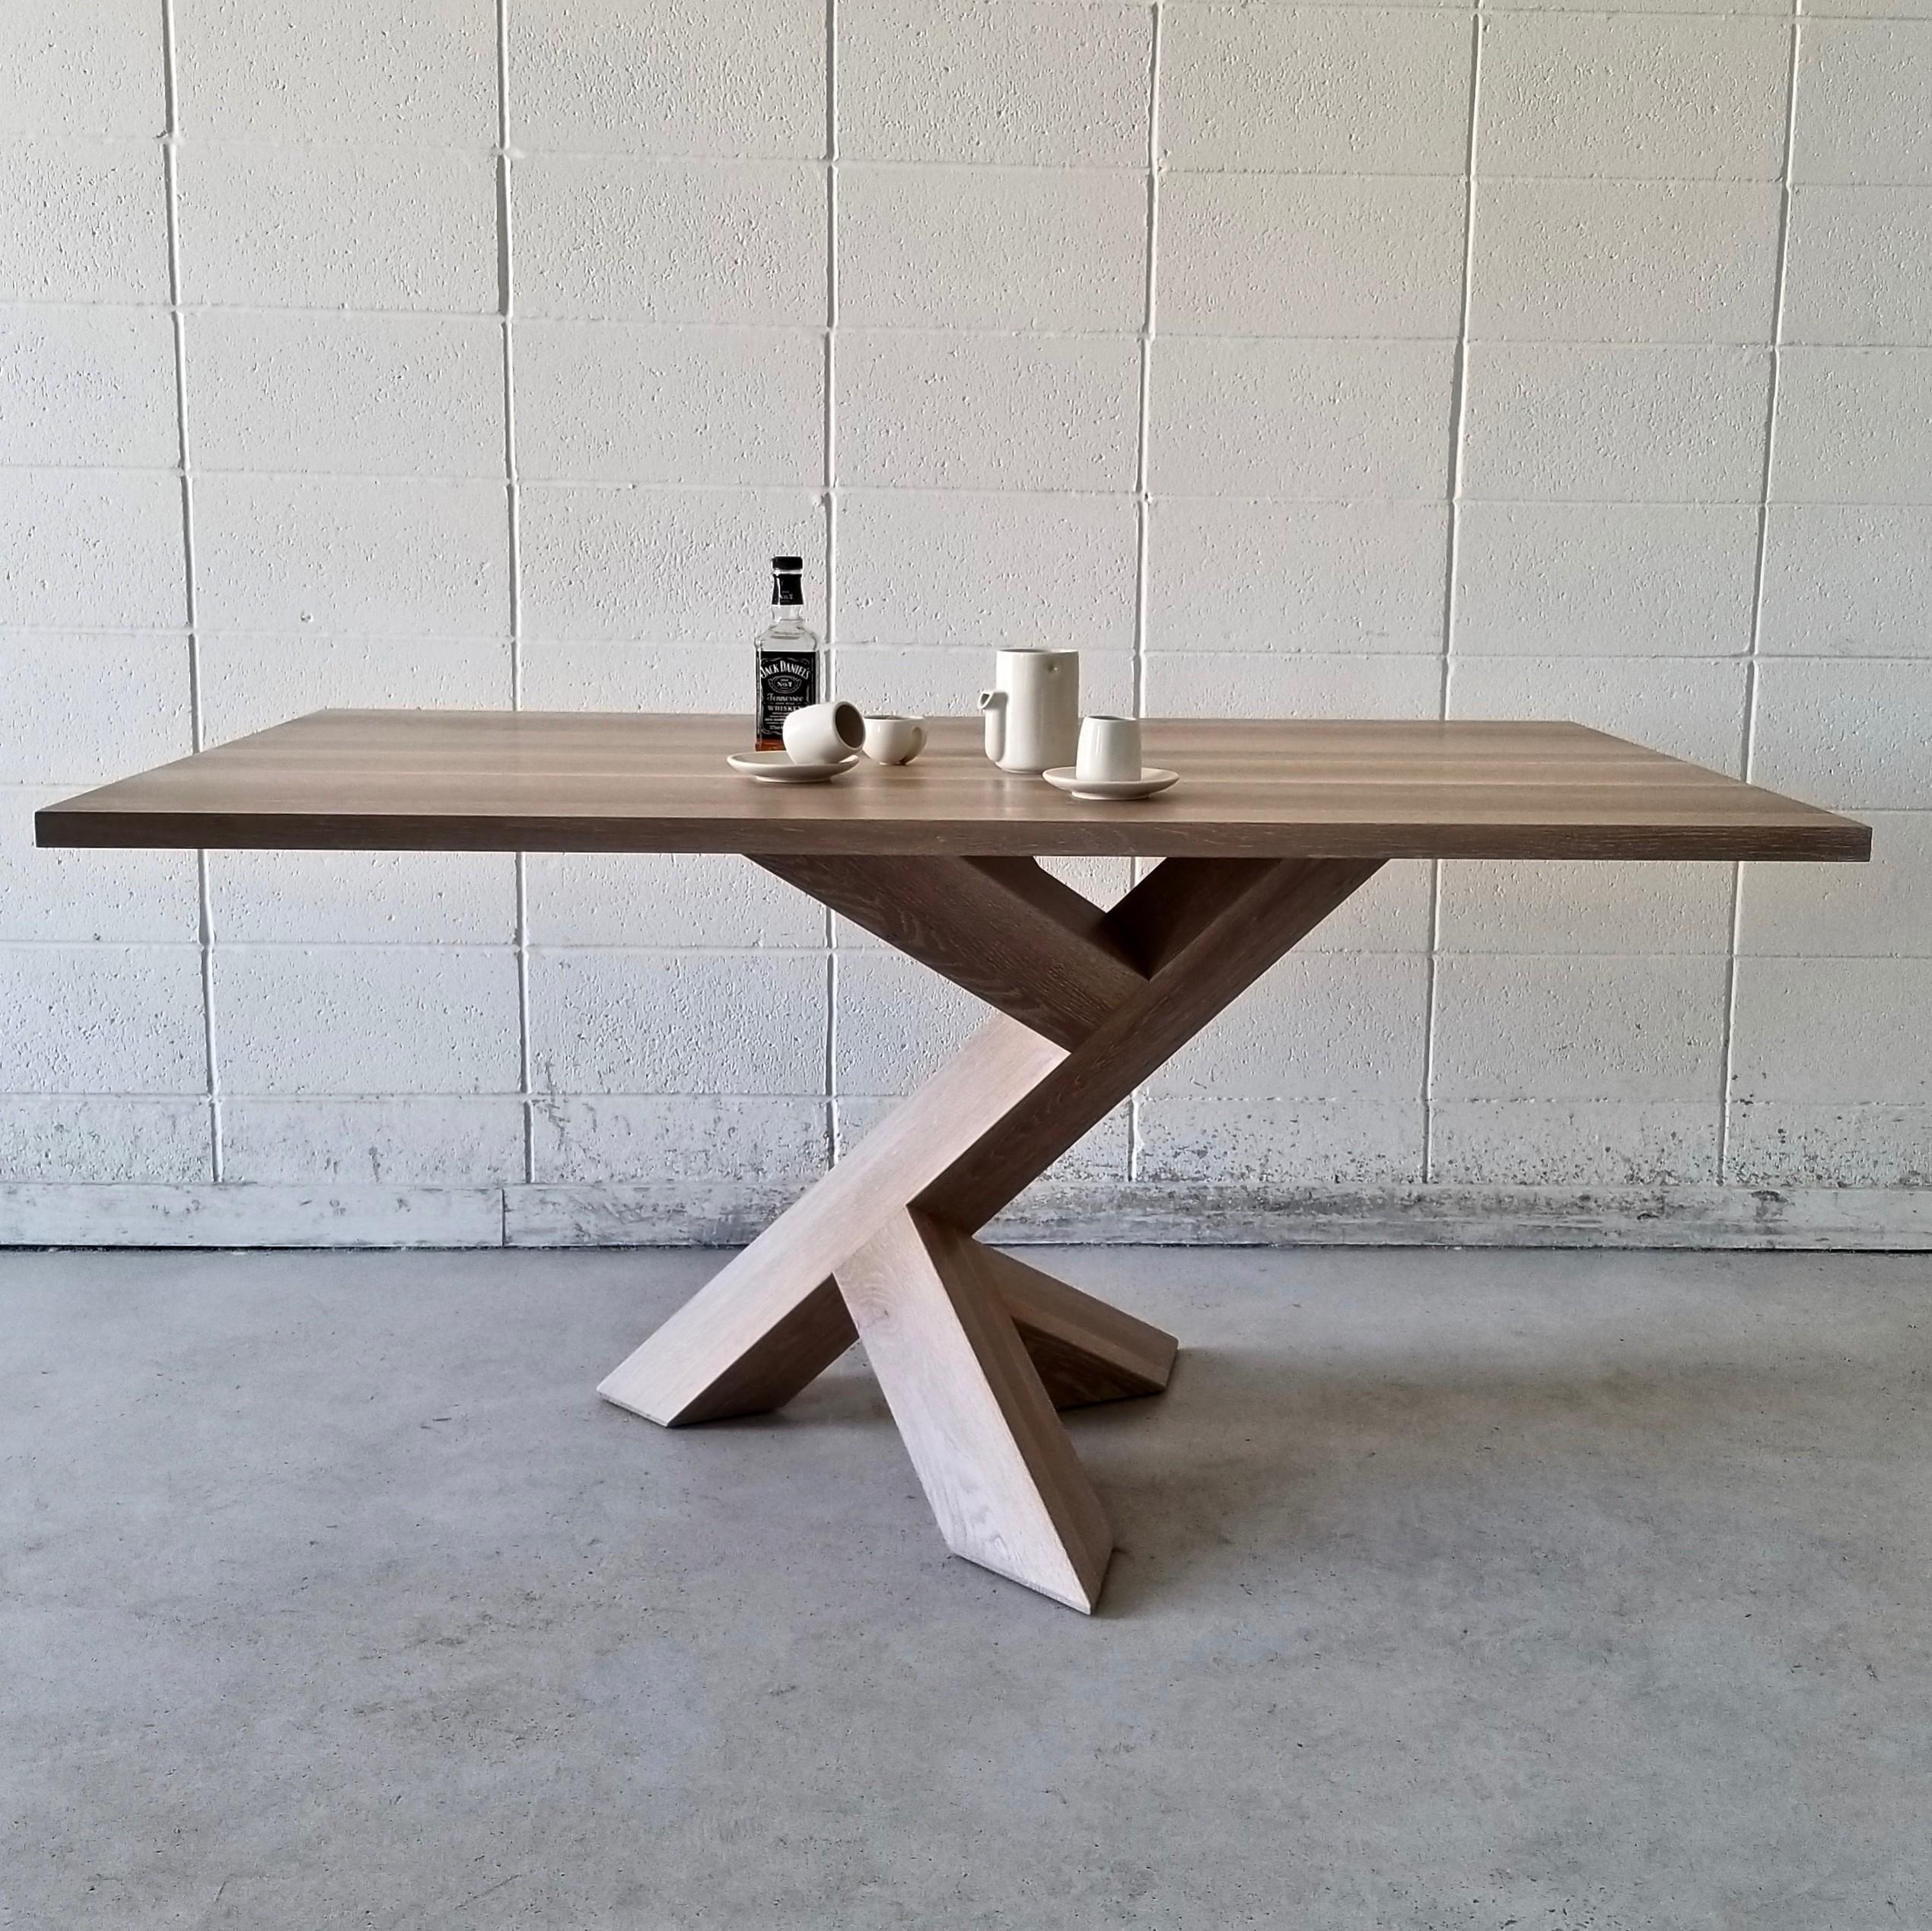 Iconoclast-Square Single-Leg Table